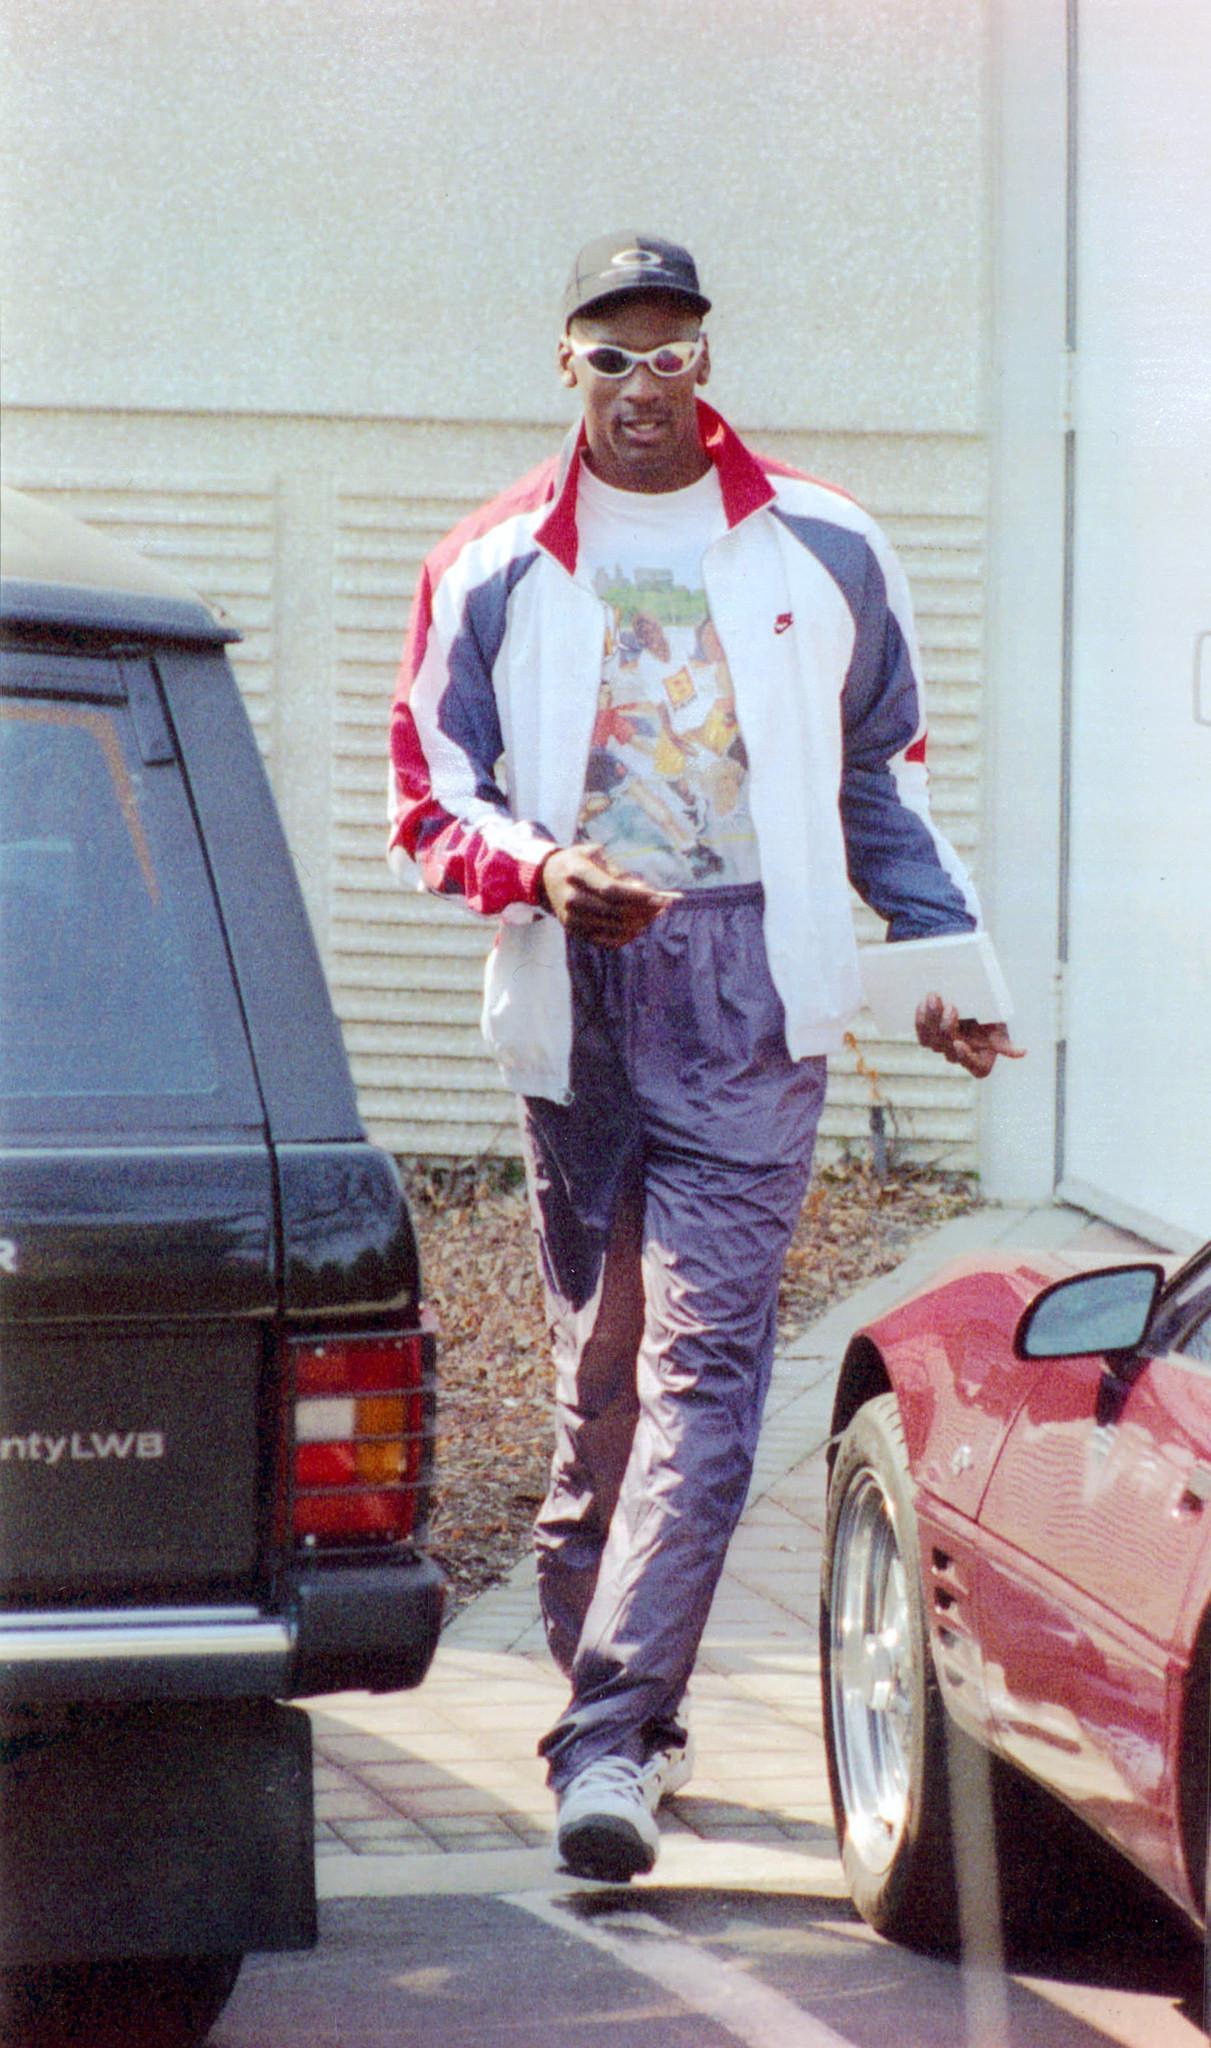 ago Michael world back